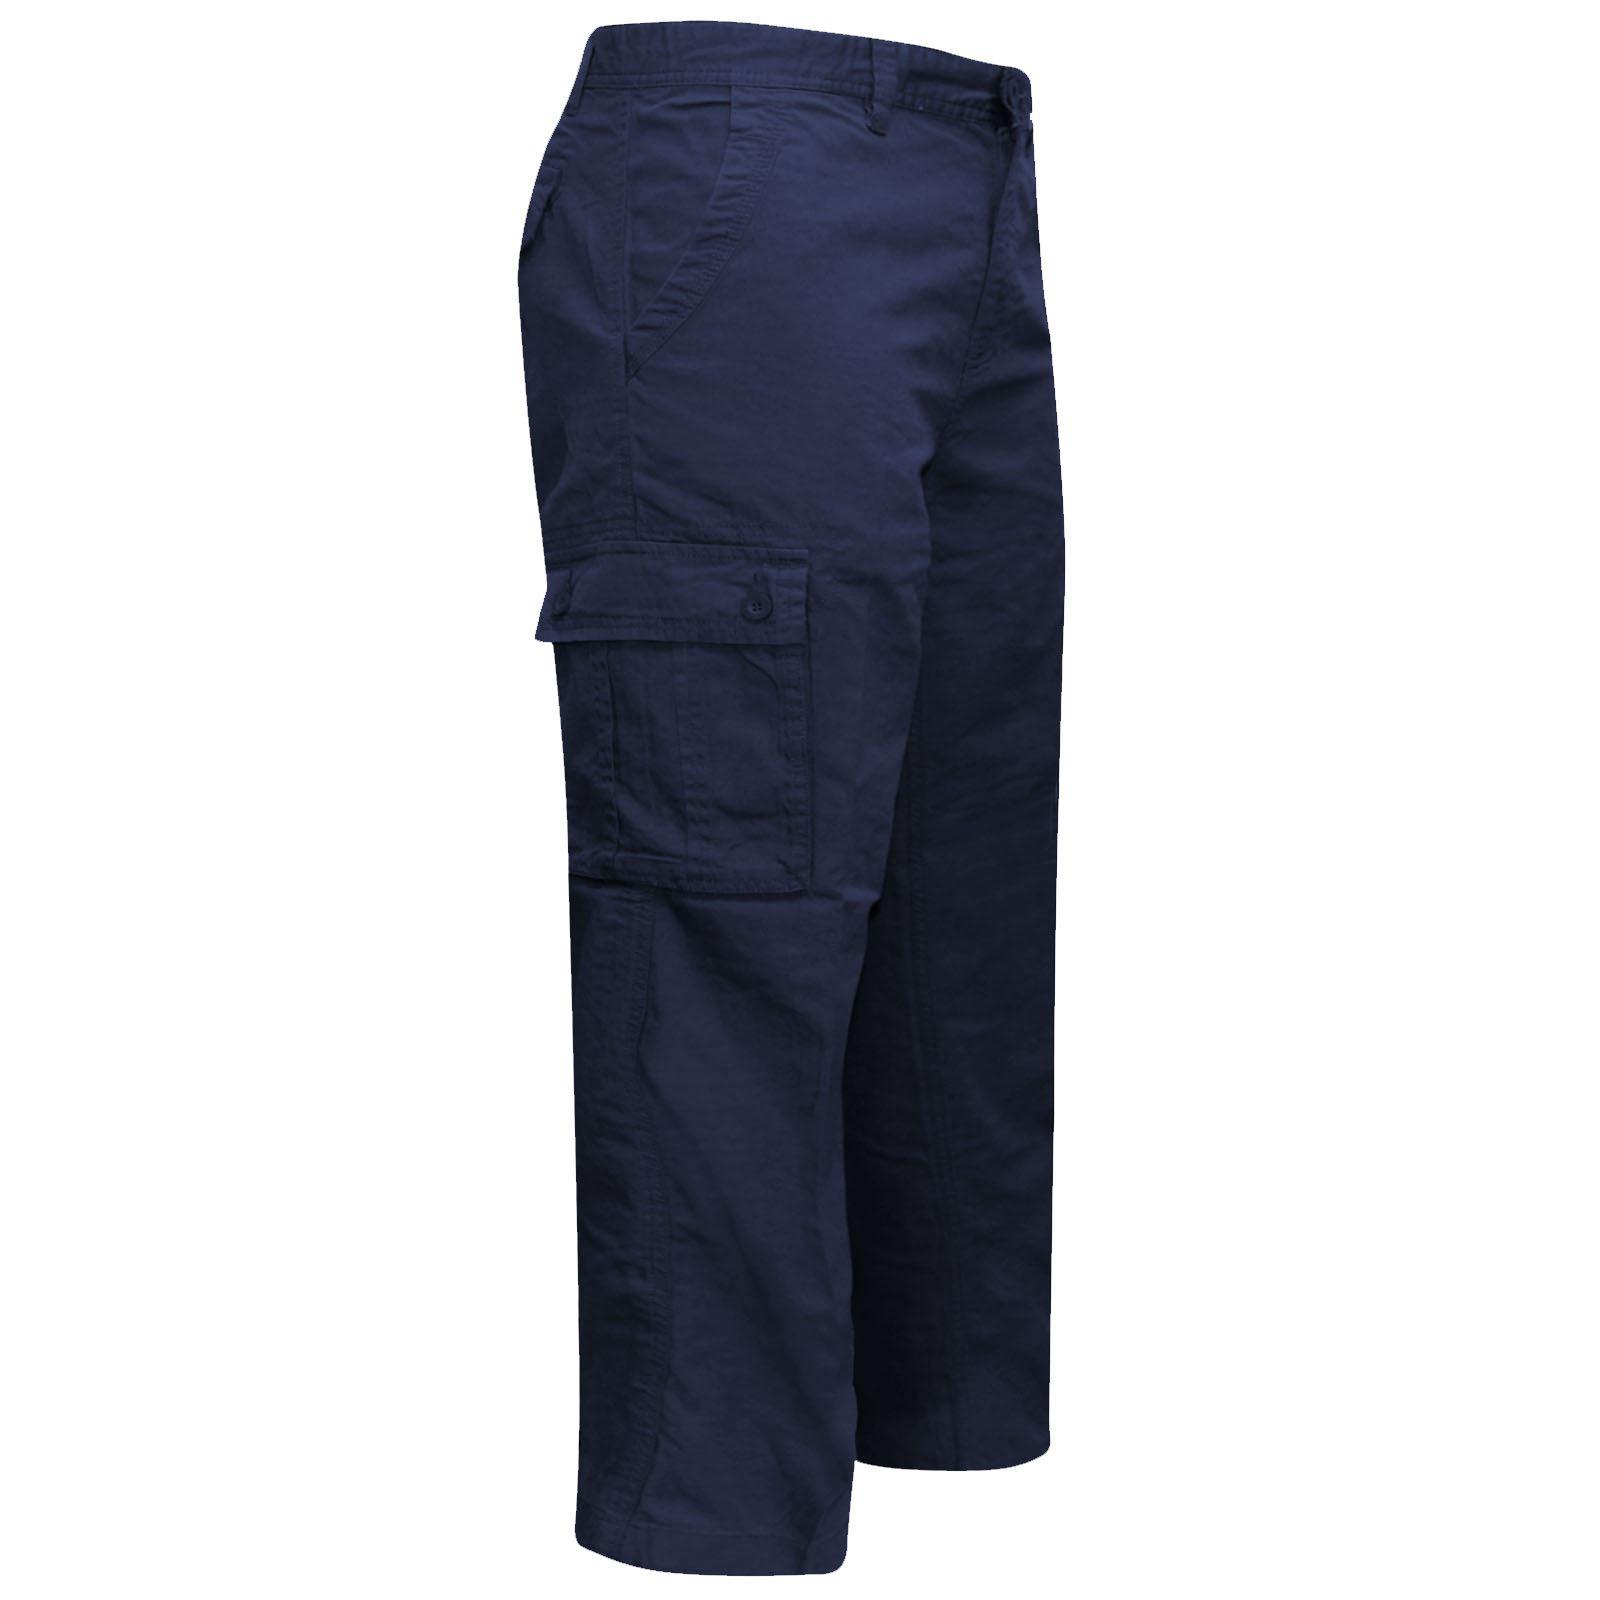 New Mens Plain Trousers Multi Pocket BHS Ex Store Formal Pants 100/% Cotton 32-46